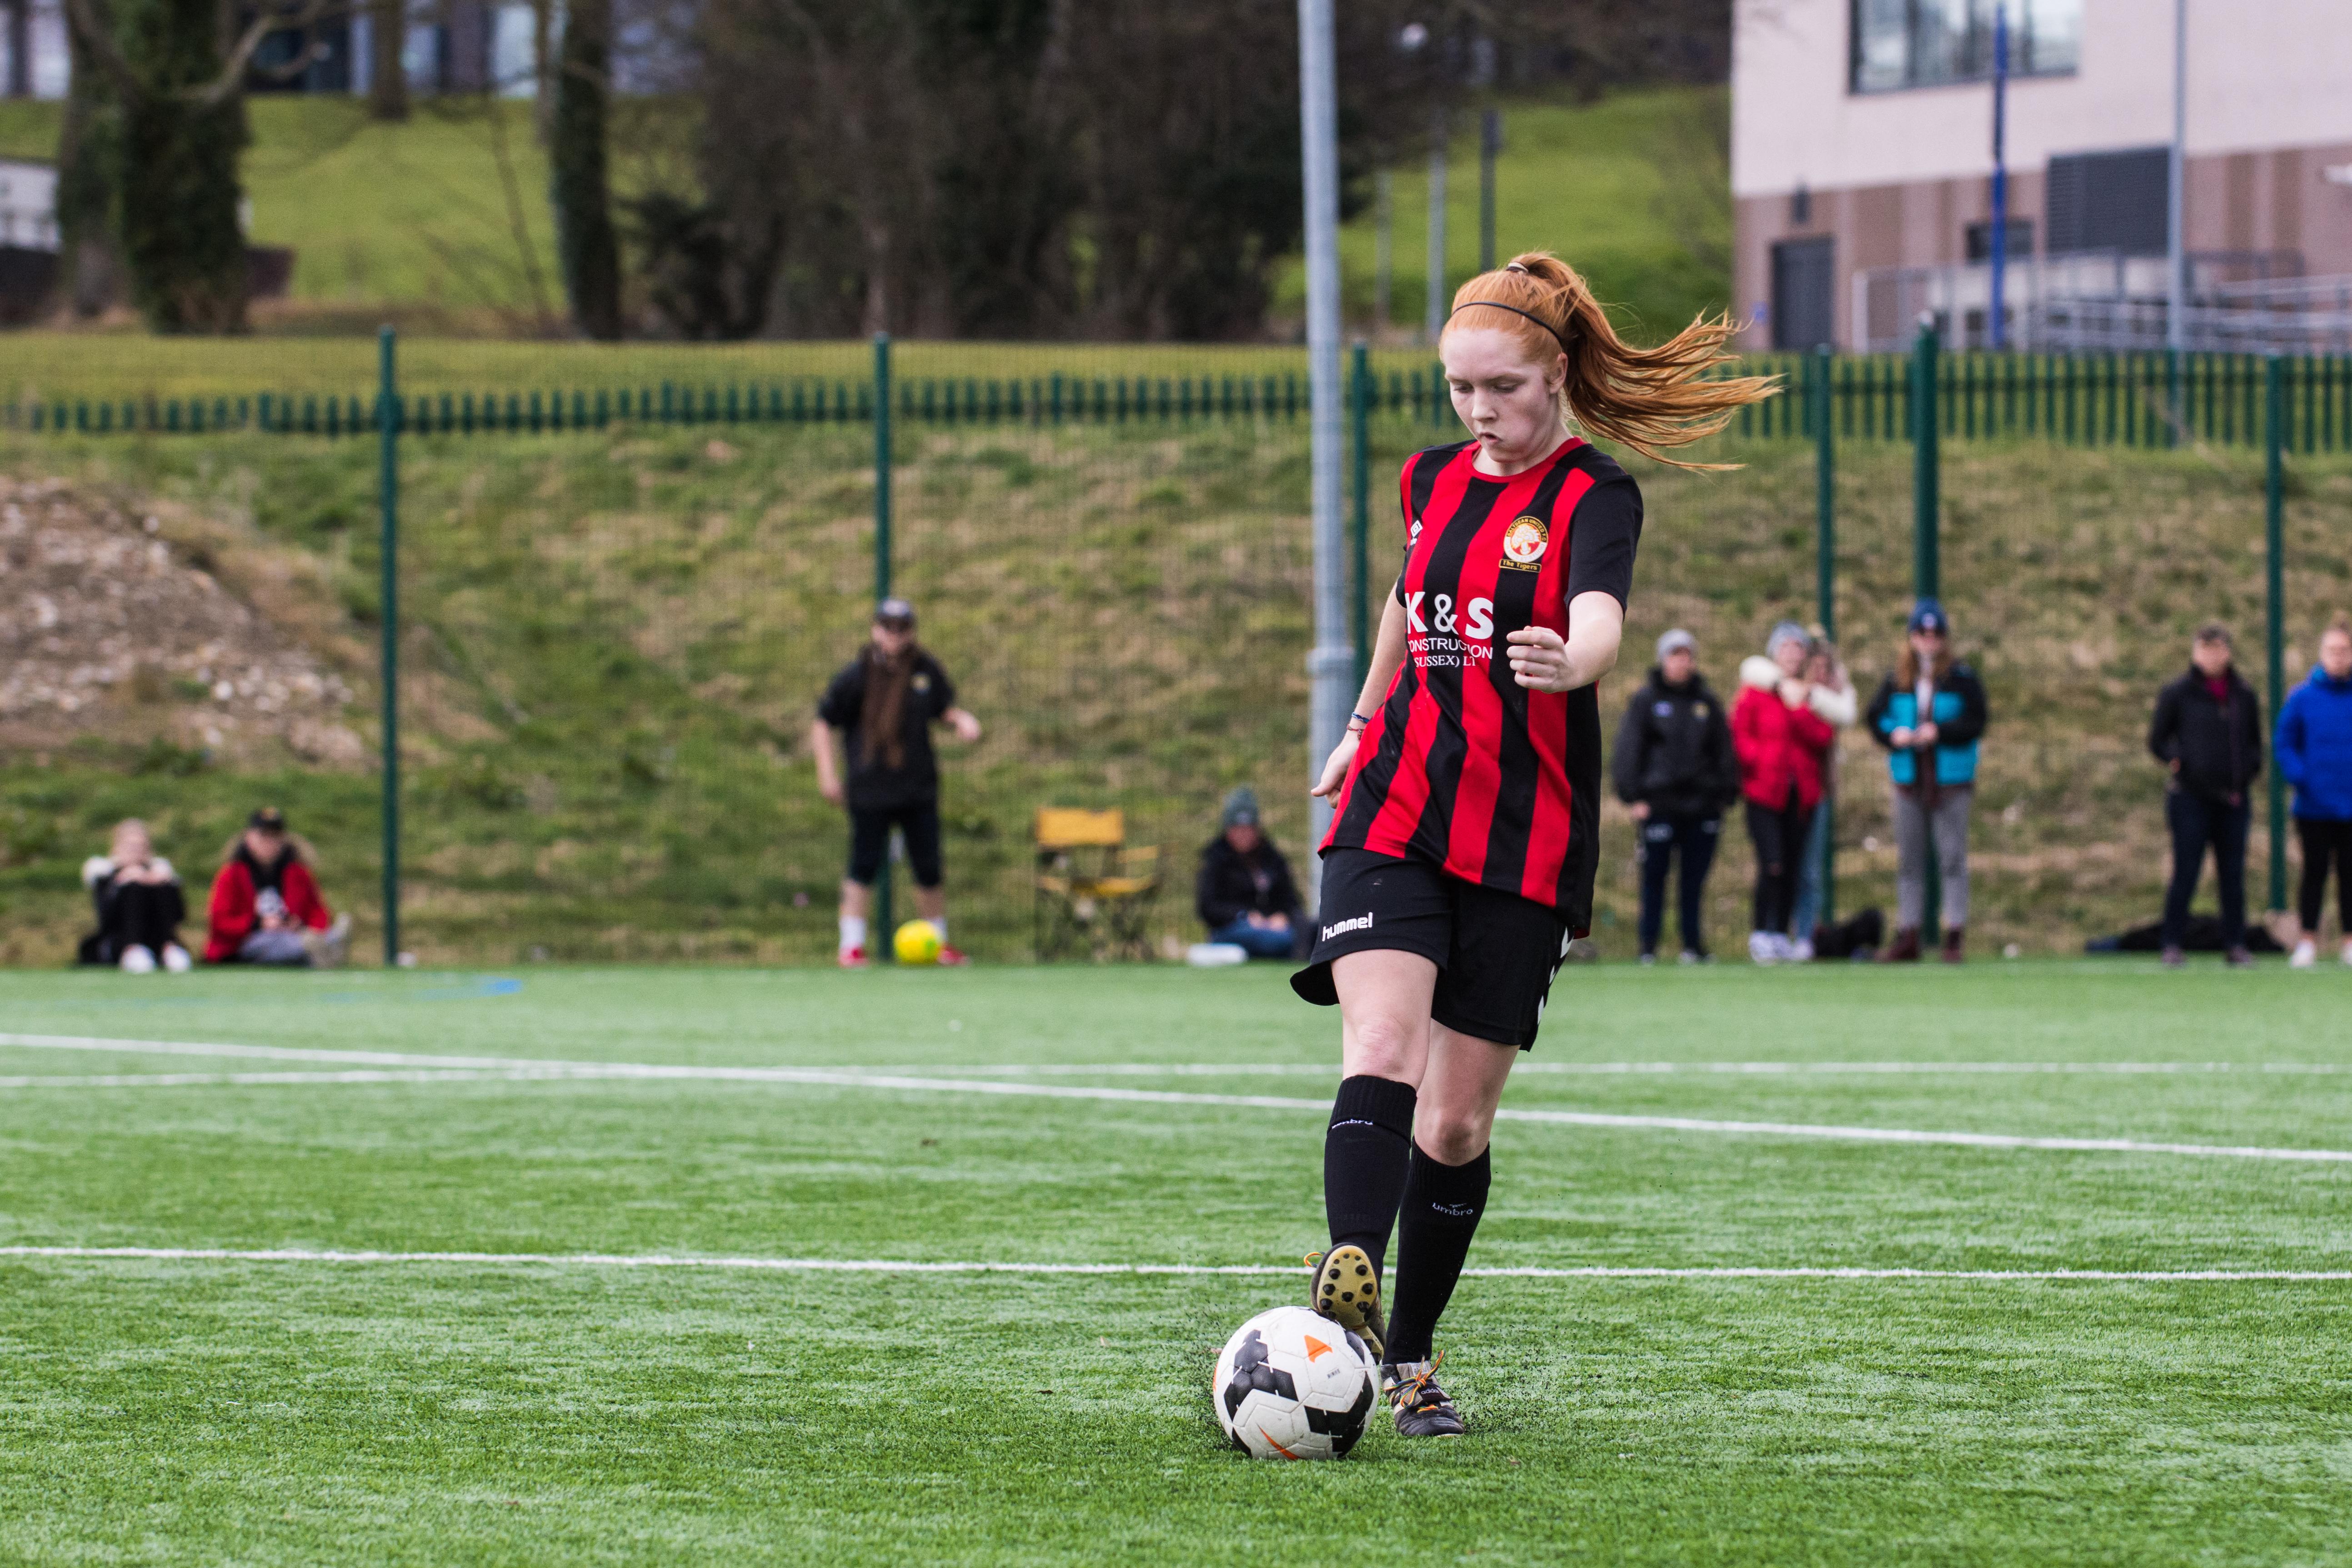 DAVID_JEFFERY Saltdean Utd Ladies FC vs Worthing Utd Ladies FC 11.03.18 45